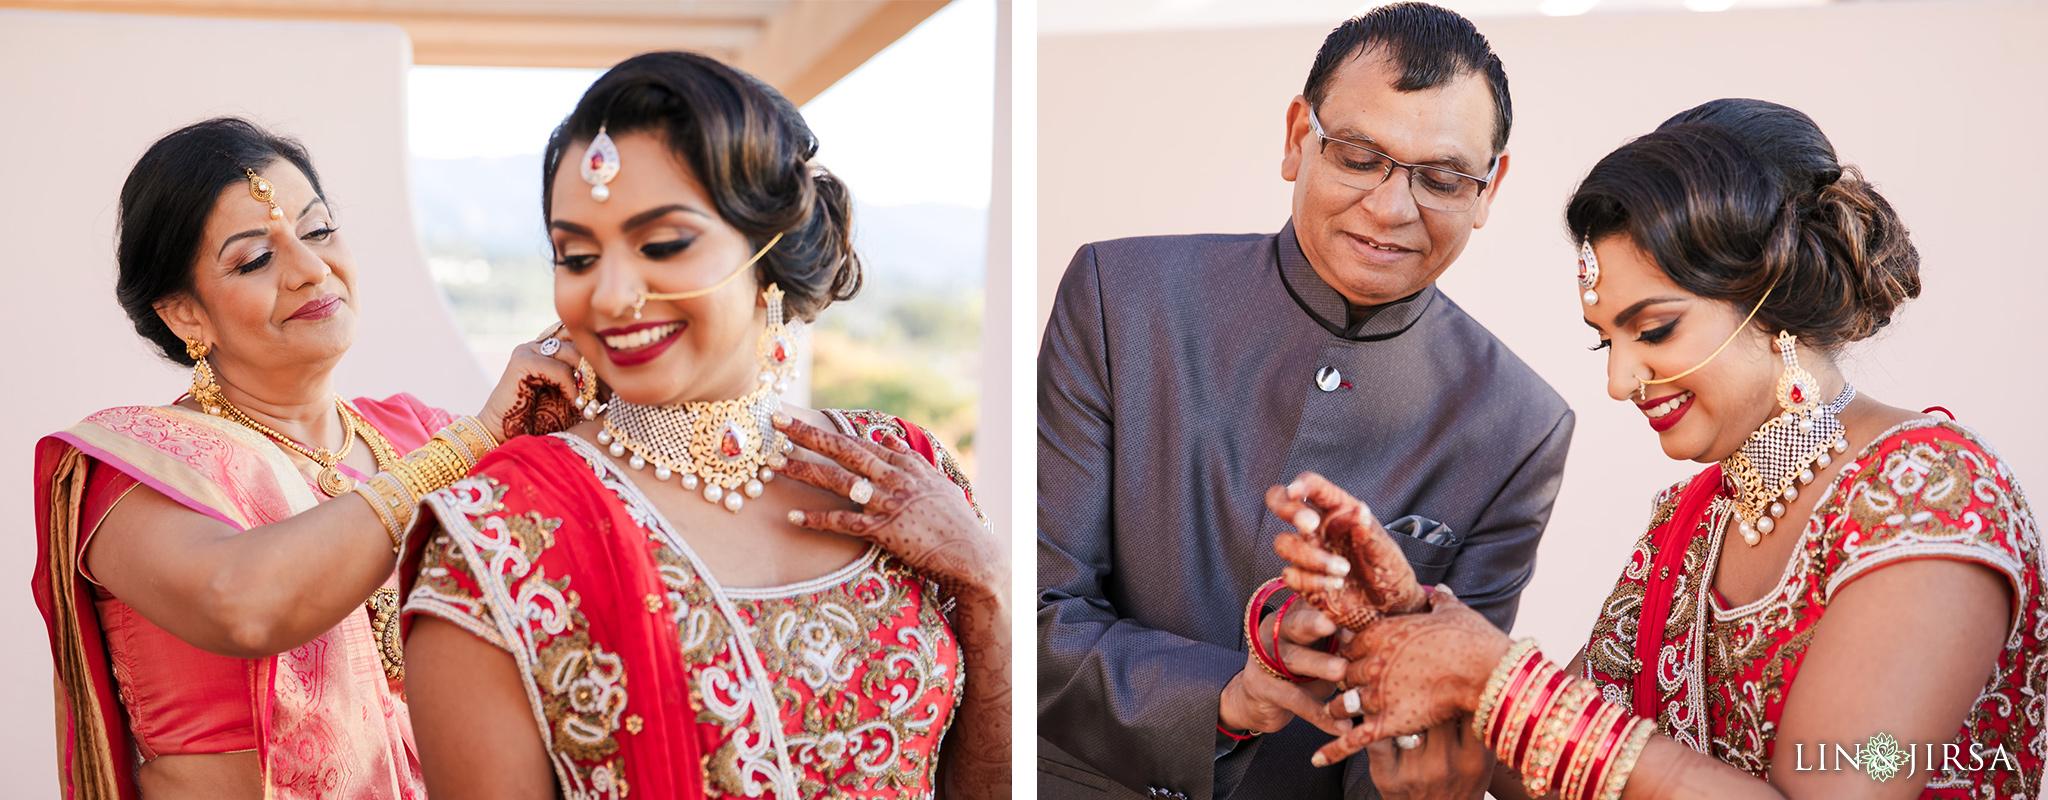 04 Hilton Santa Barbara Indian Wedding Photography